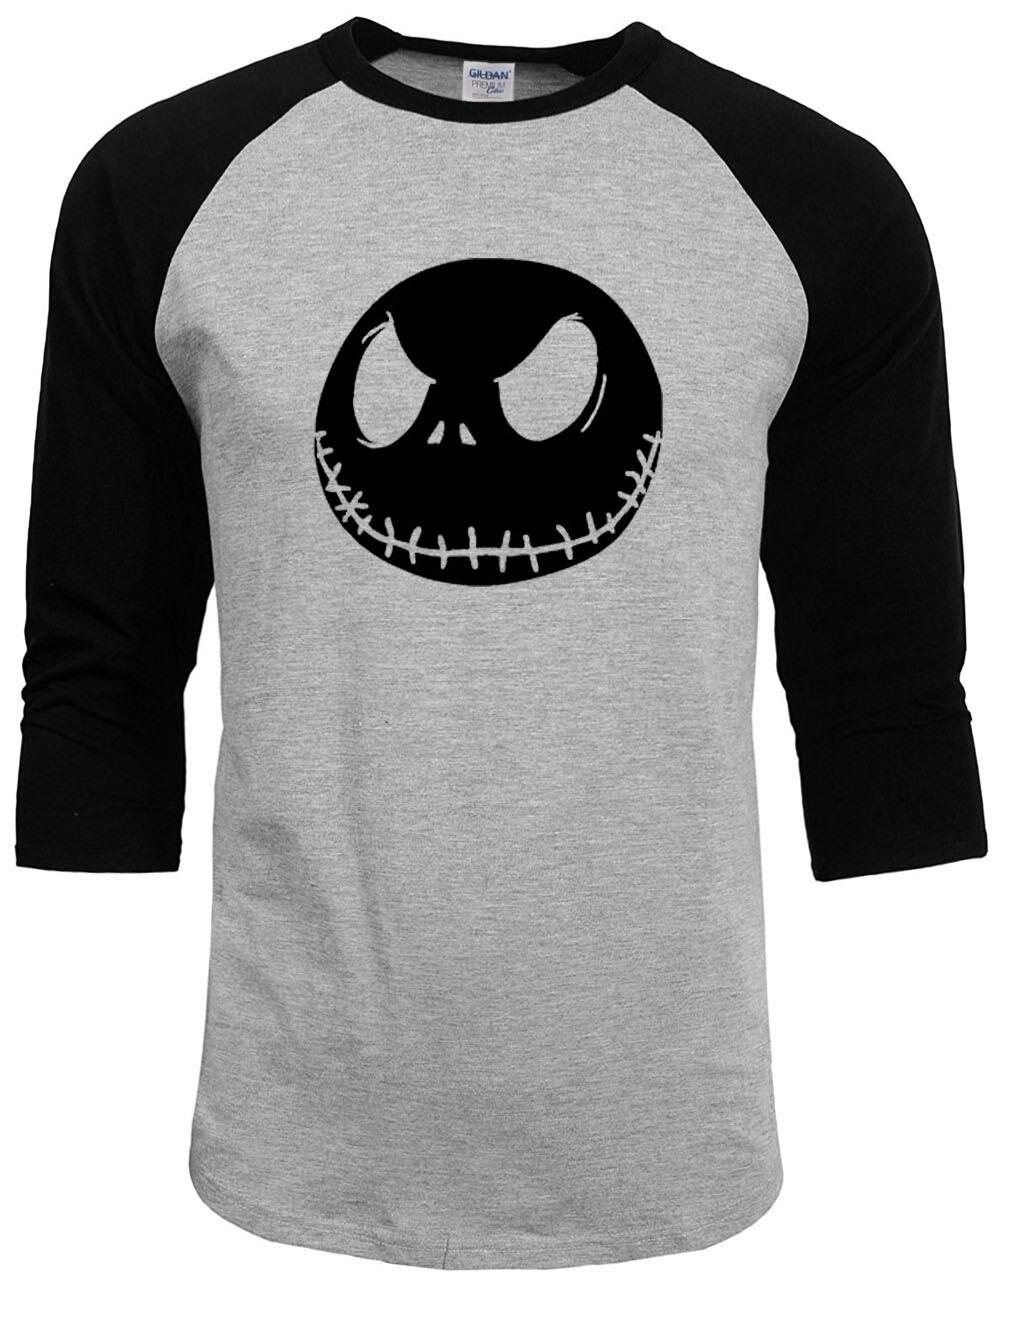 New Mens T Shirt Nightmare Before Christmas Jack Skellington Male Charcoal T-Shirt 100% Cotton raglan Sleeve summer autumn Tops